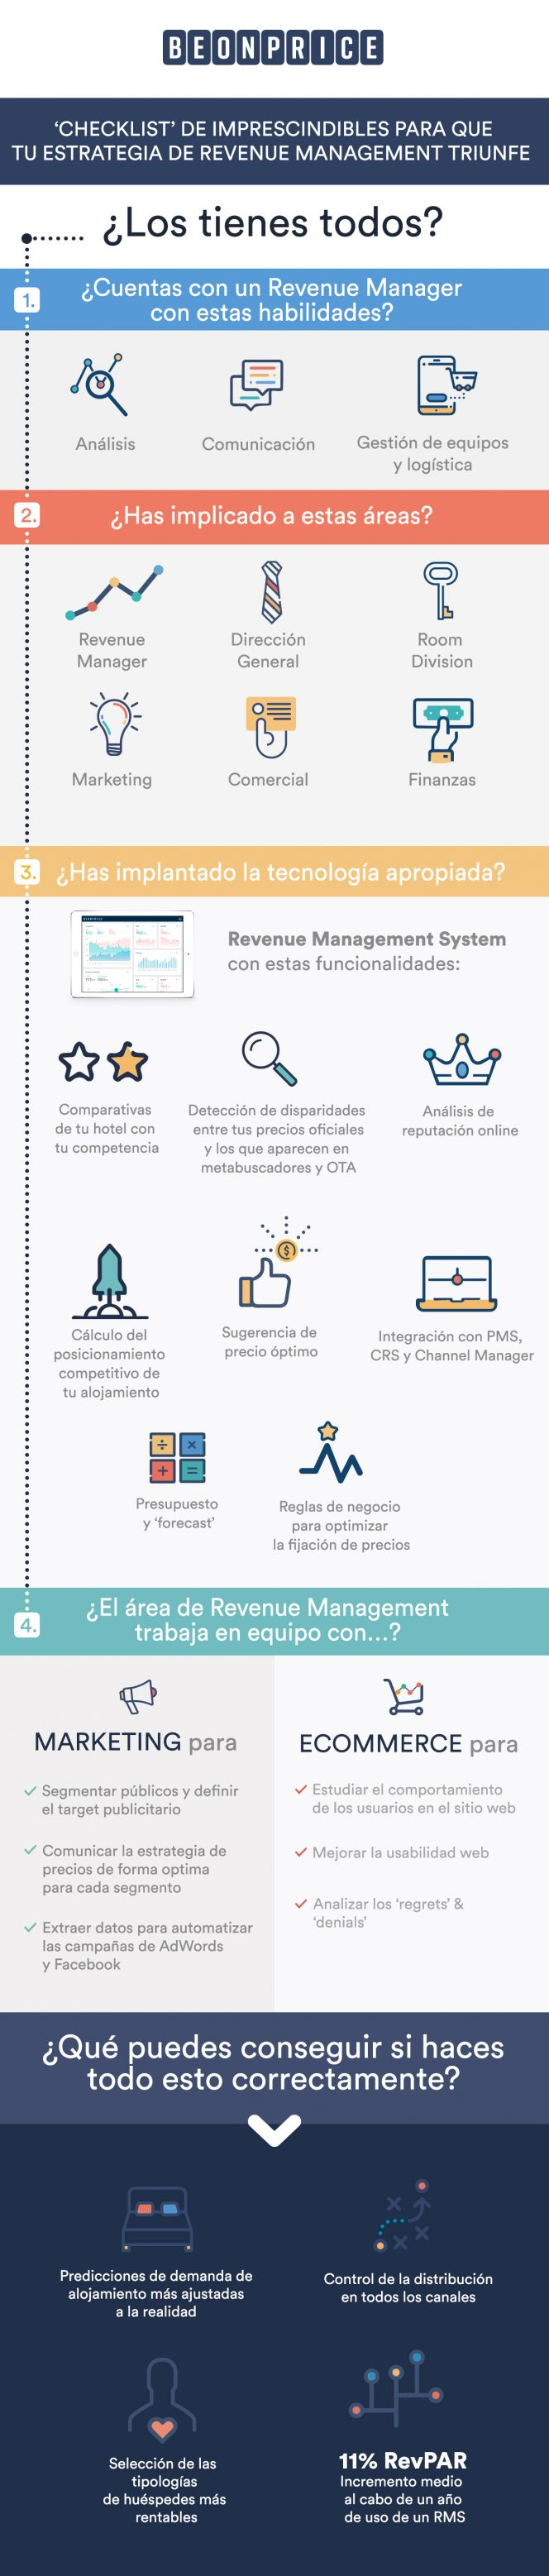 Infografia_Beonprice_Newv6 (5)